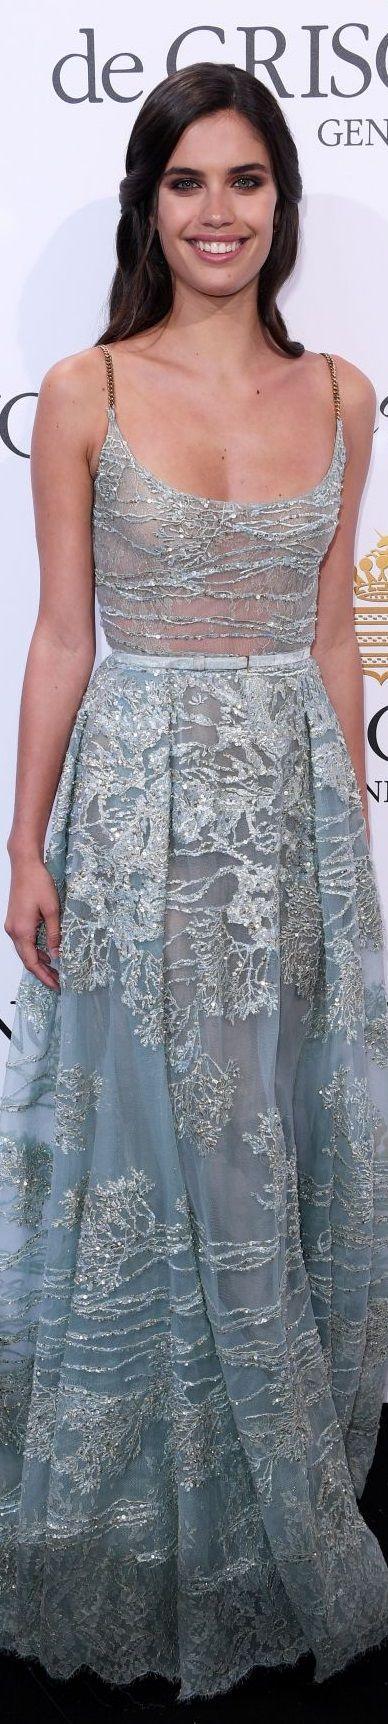 Sara Sampaio in Elie Saab Cannes Film Festival 2017